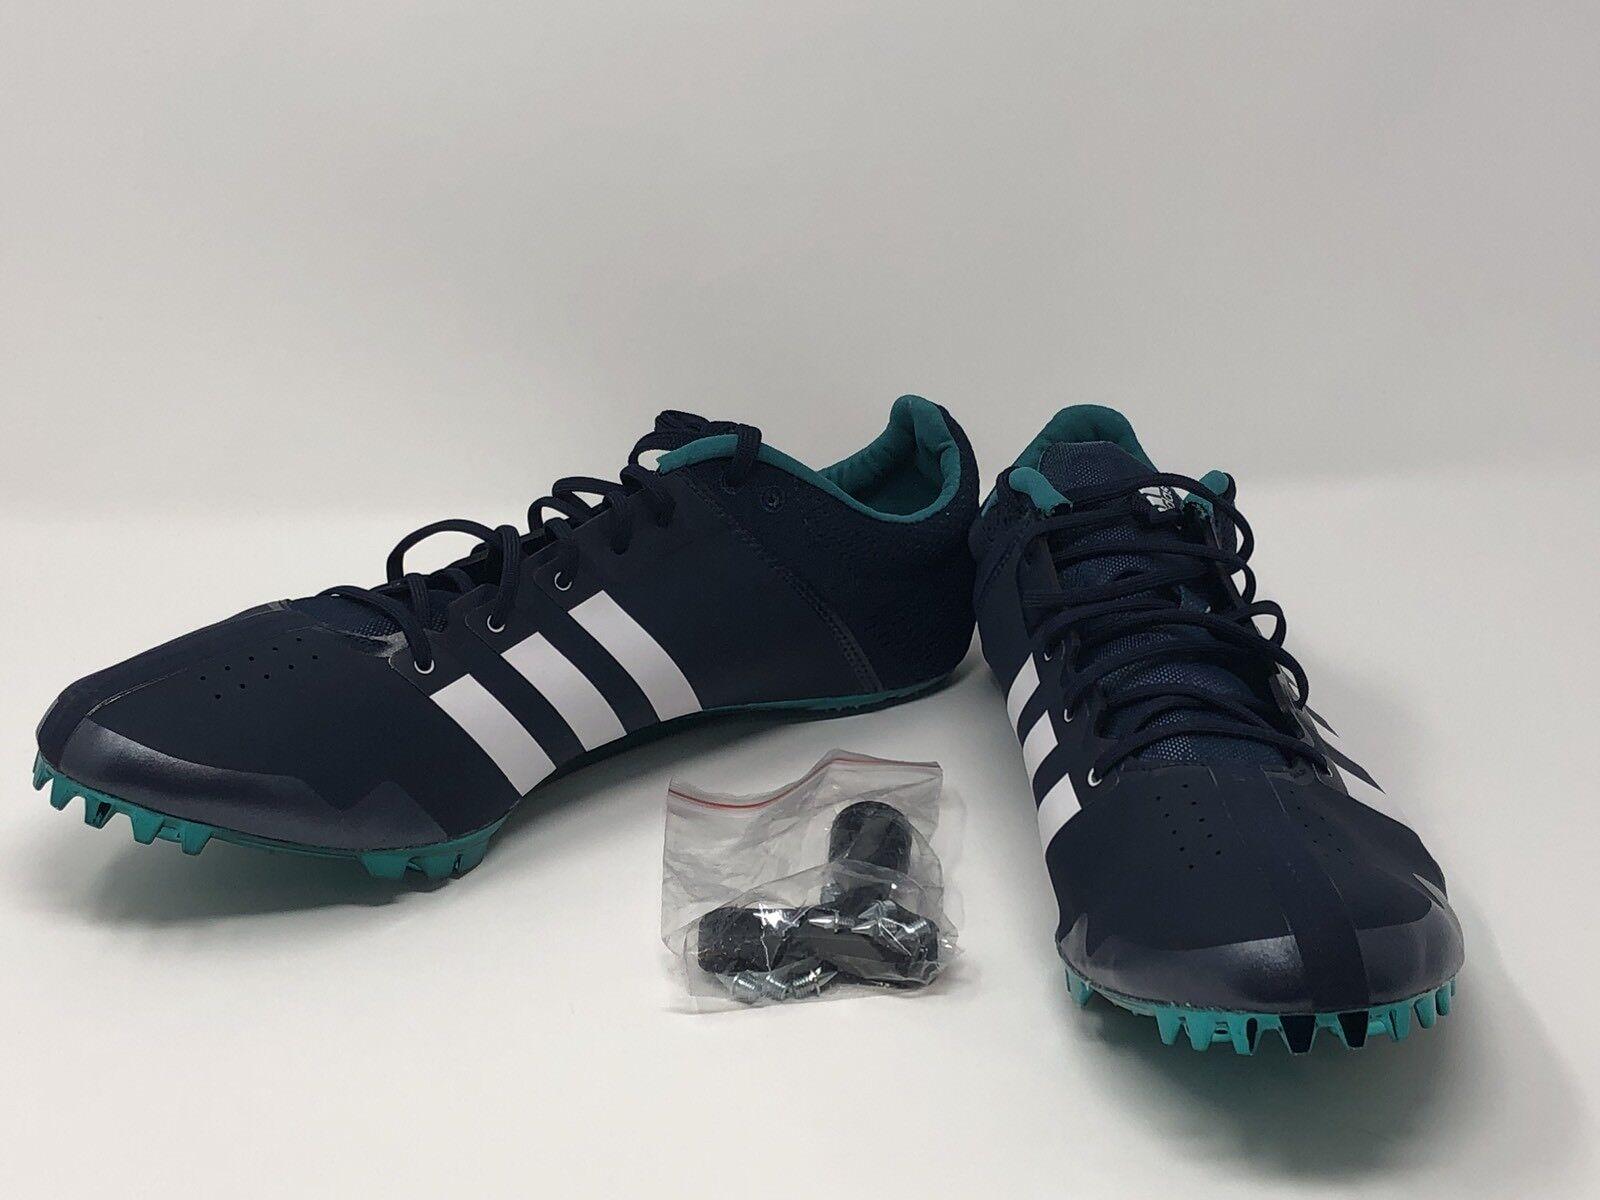 New Adidas Adizero Prime Finesse Sprint Track Spikes Men's Comfortable Cheap women's shoes women's shoes